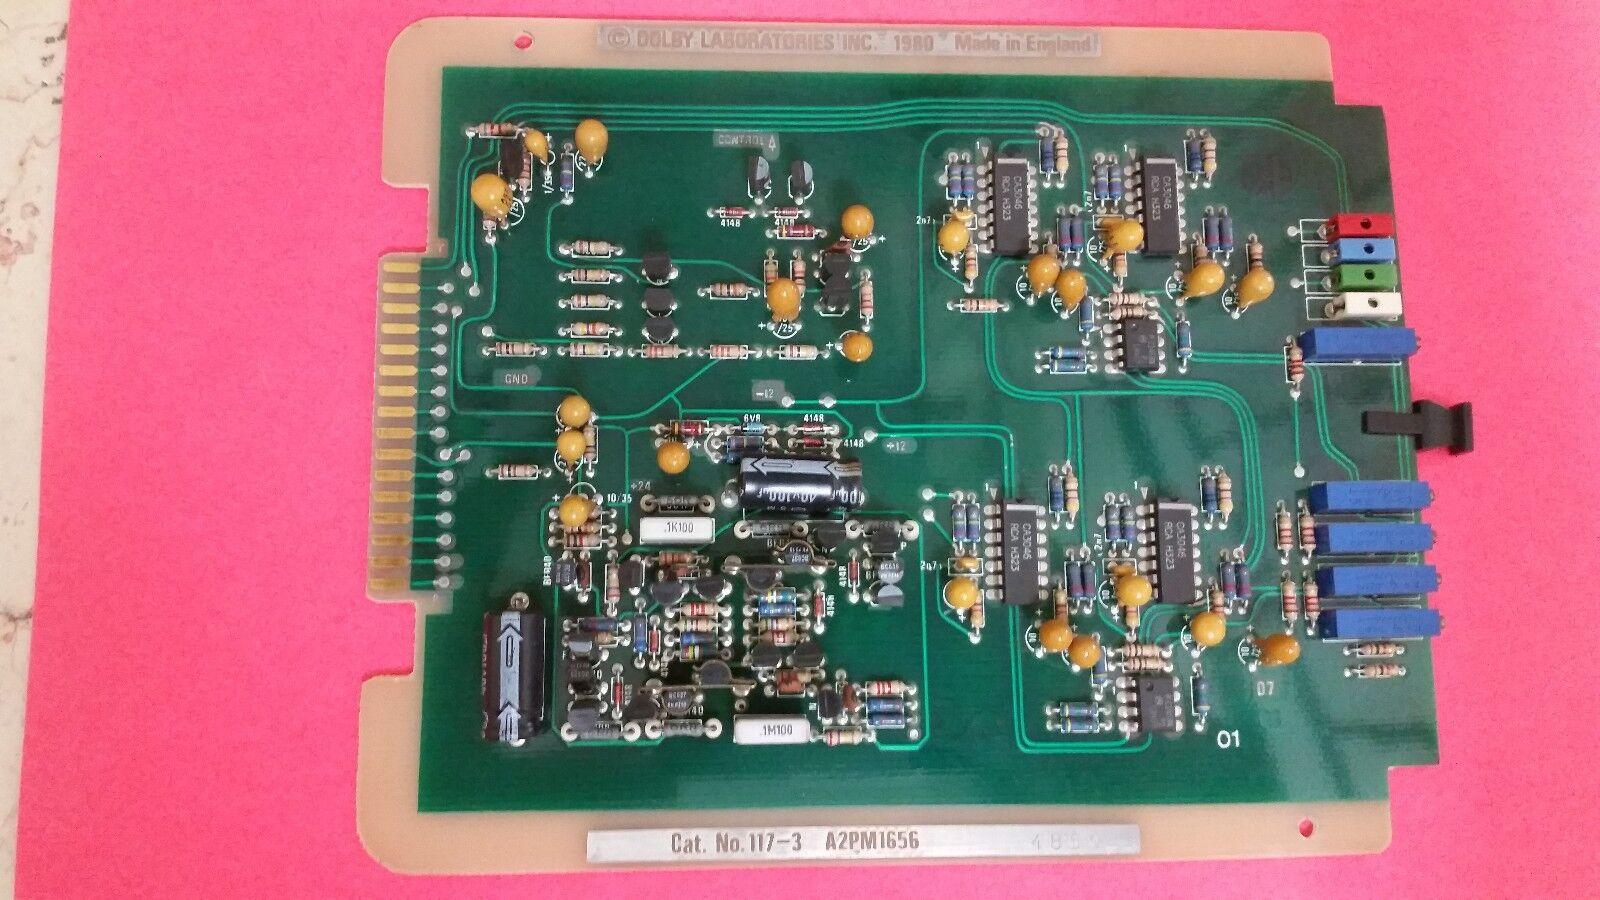 Remoto Fader Tarjeta módulo Gato no.117-3. Dolby Dolby Dolby Laboratories Inc sistemas a2pm1656 620671